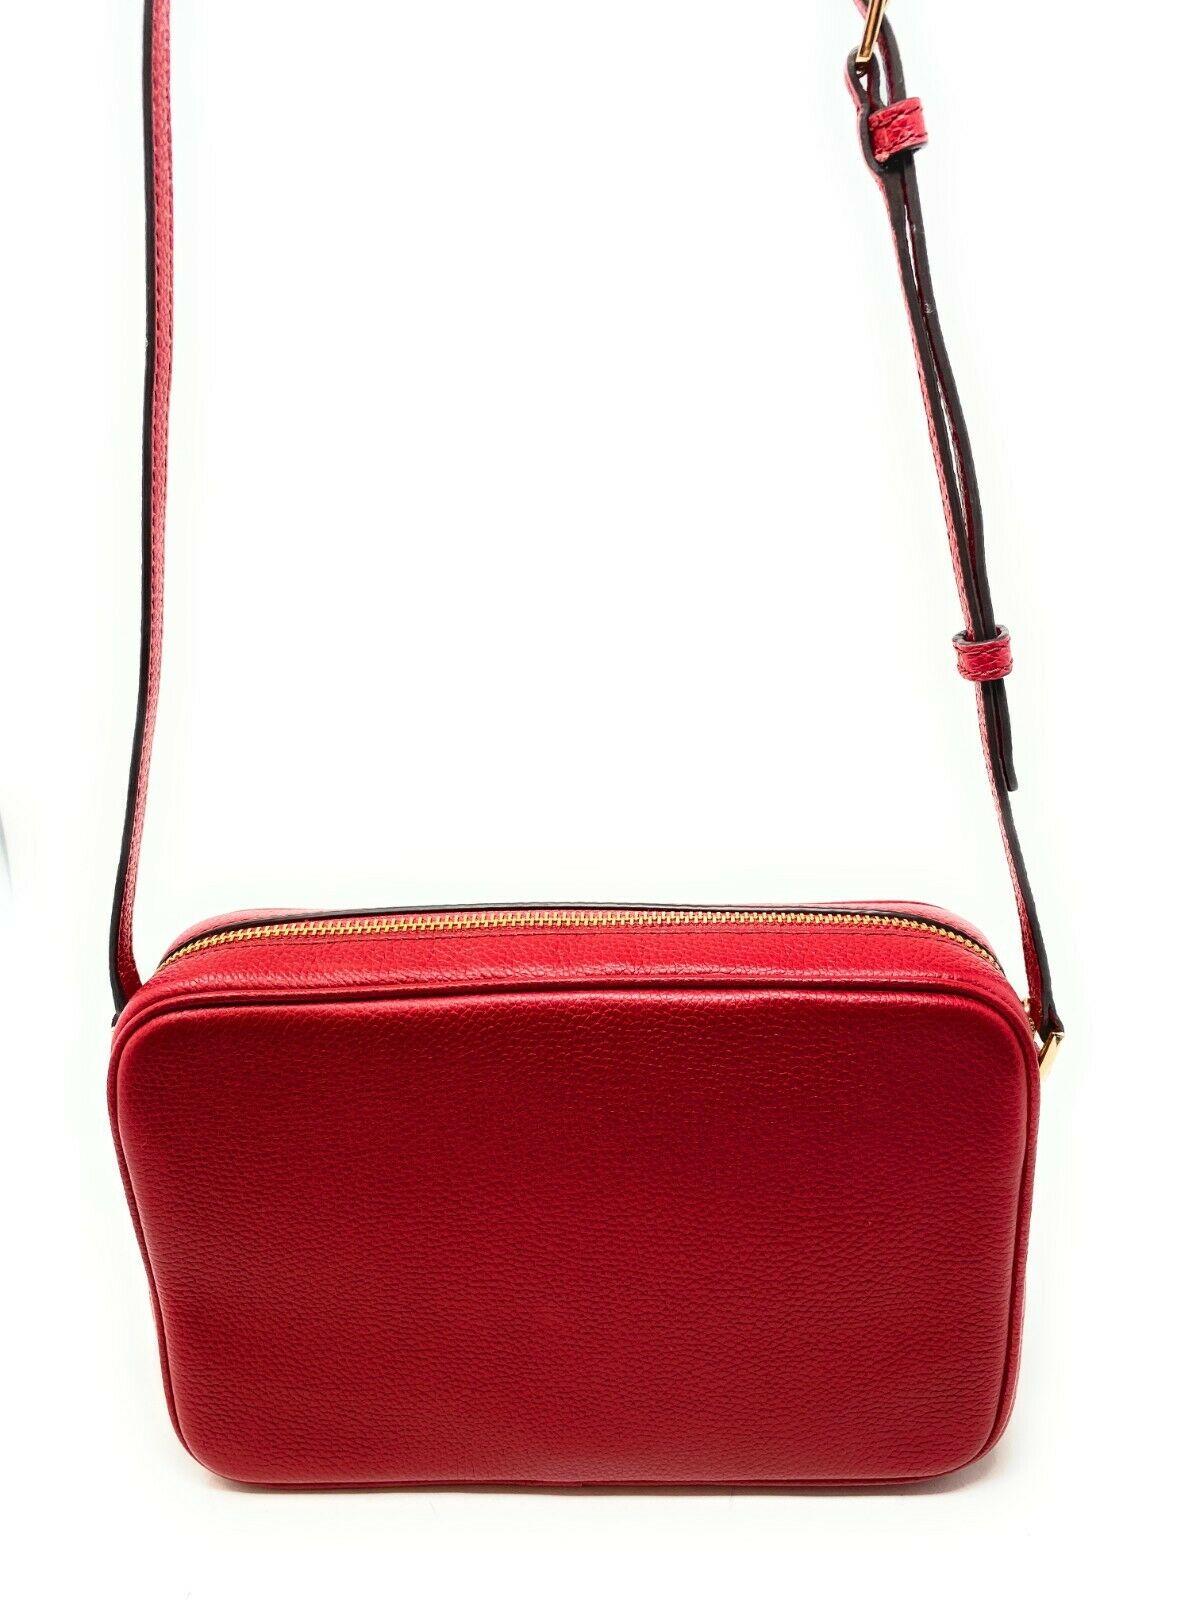 thumbnail 29 - Michael Kors Jet Set Item Large East West Crossbody Chain Handbag Clutch $298